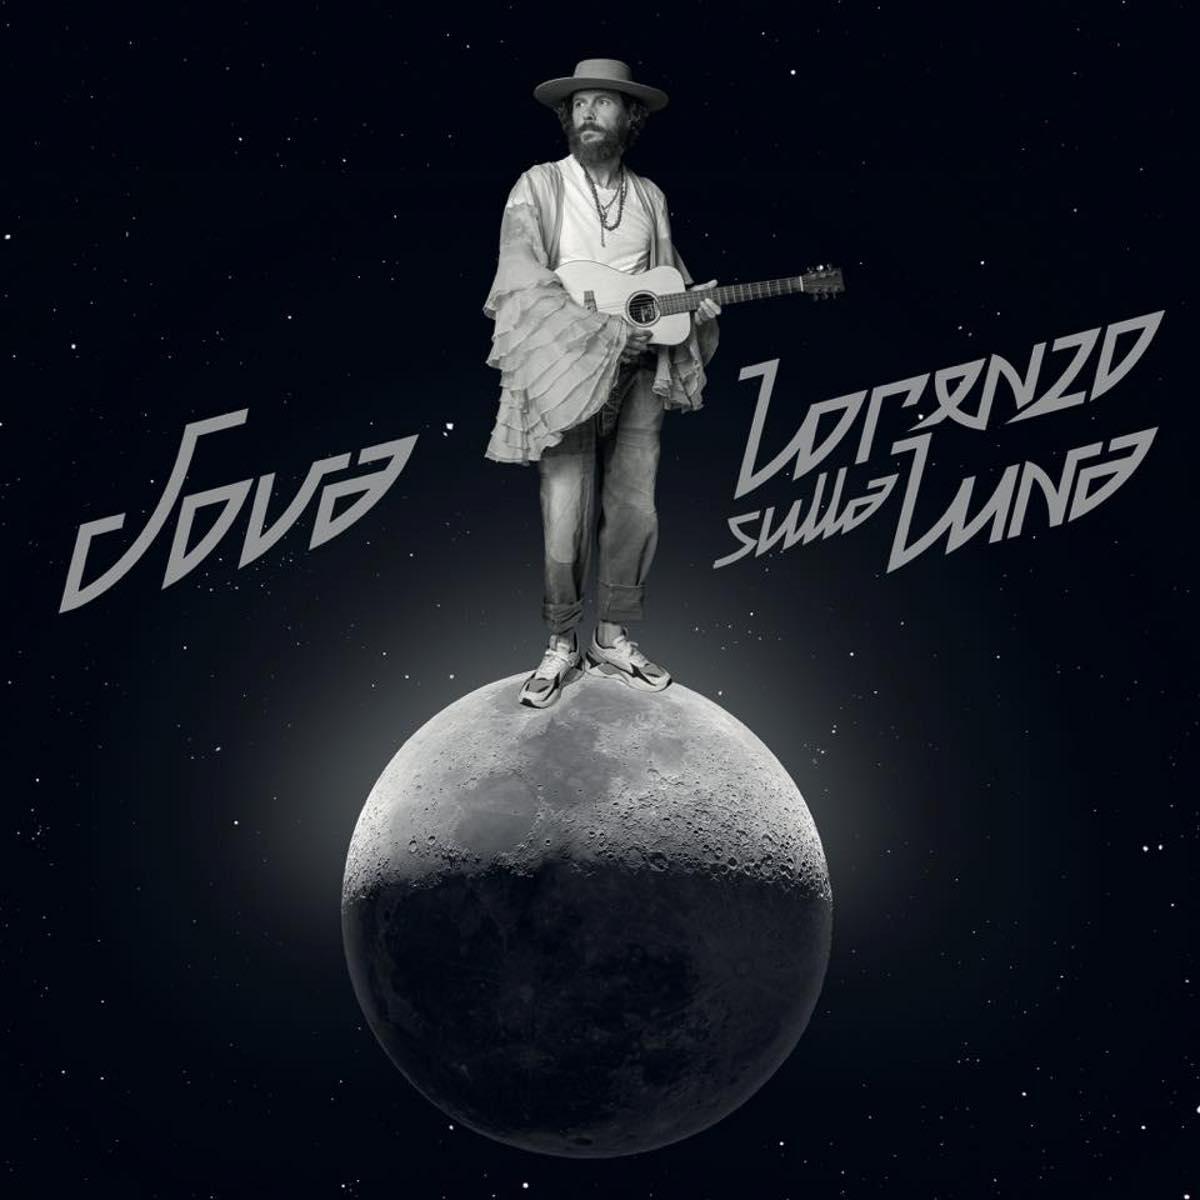 Jovanotti Lorenzo sulla luna album 2019 copertina